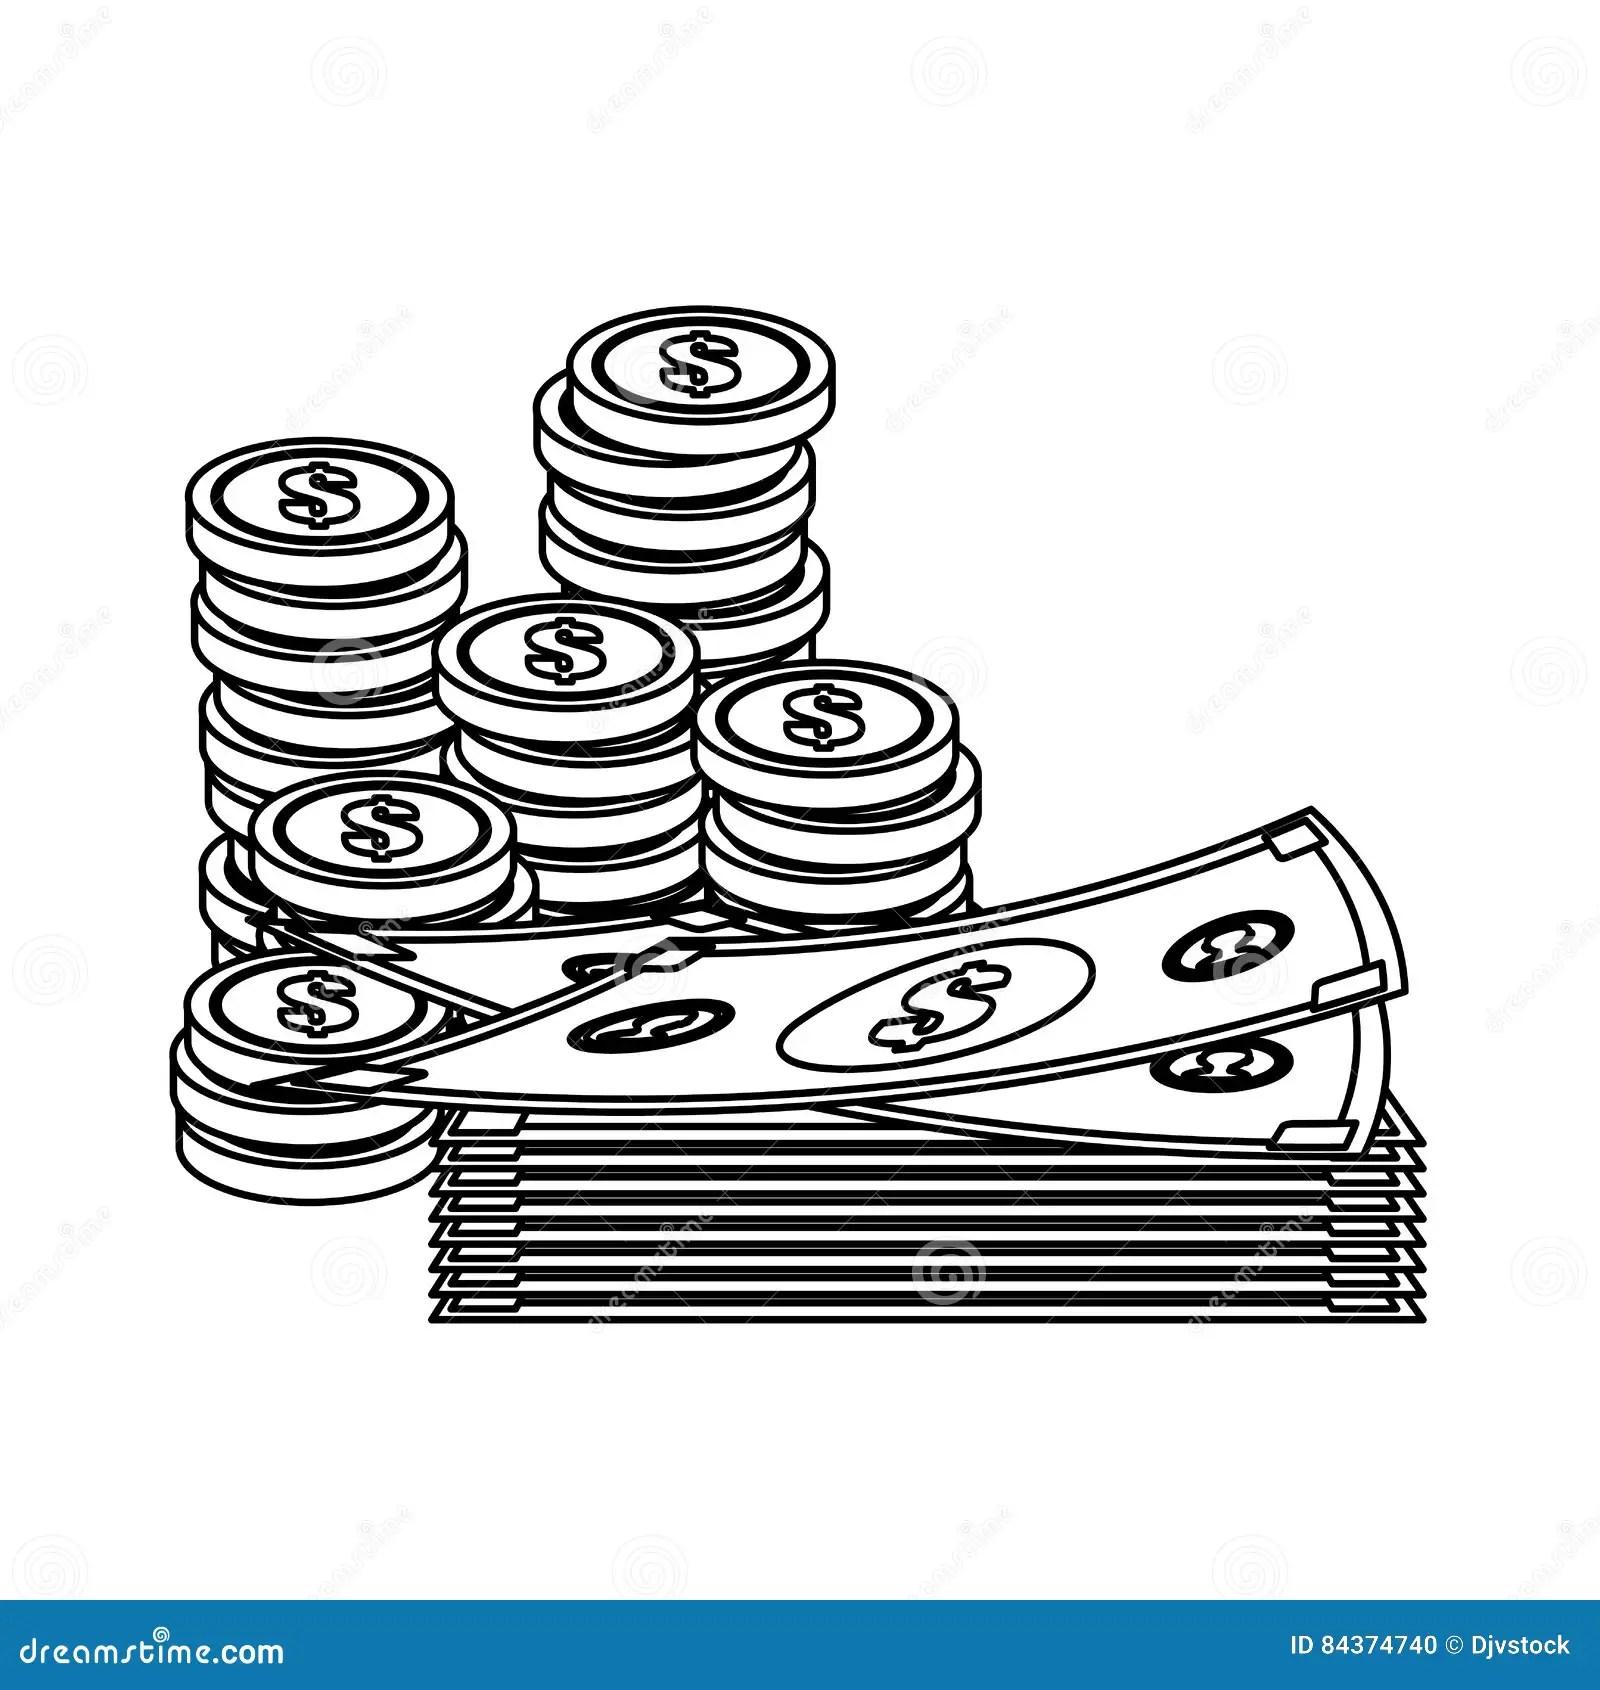 Money Bills And Coins Stock Illustration Illustration Of